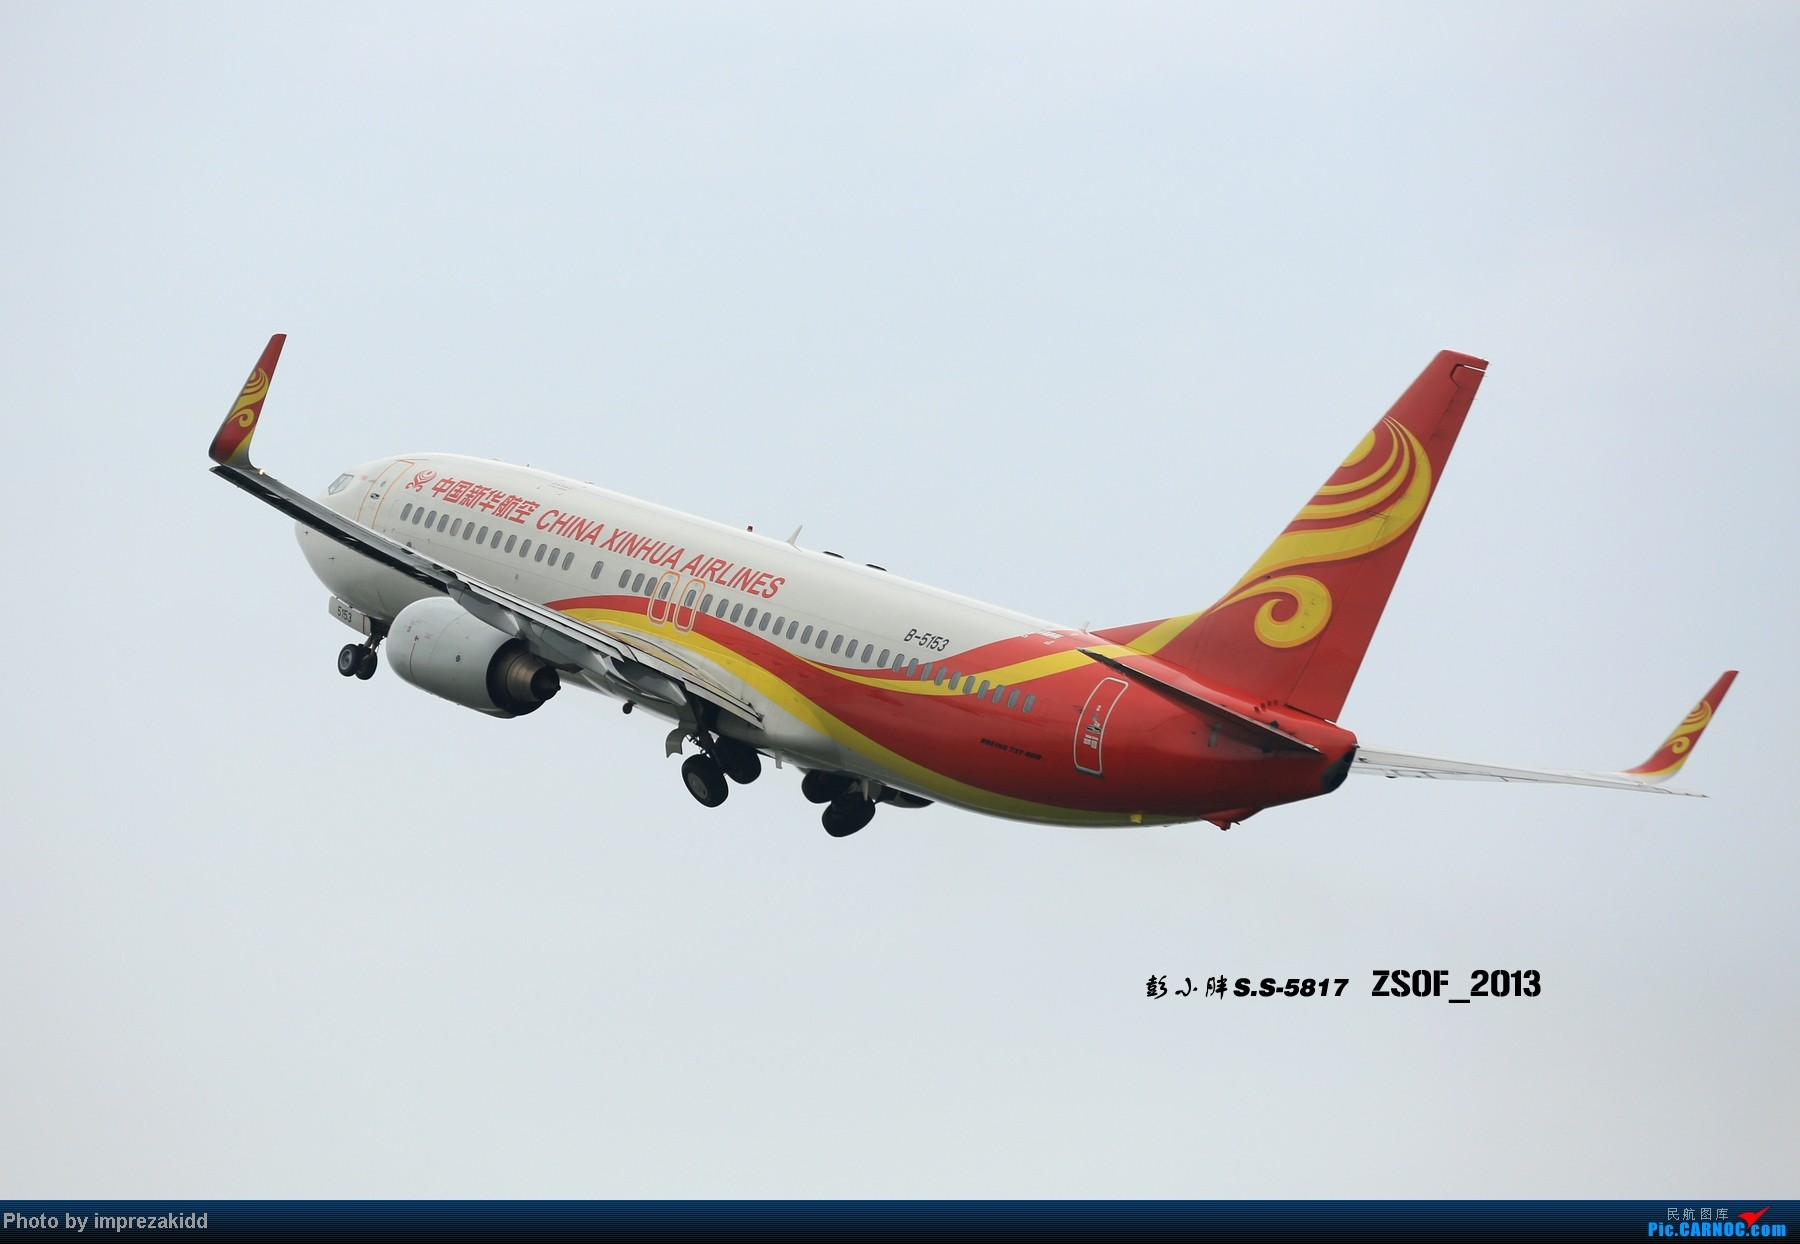 Re:[原创]【骆幕迎新】骆岗LastDay 纪念曾经属于我们的骆岗 BOEING 737-800 B-5153 ZSOF 小二楼